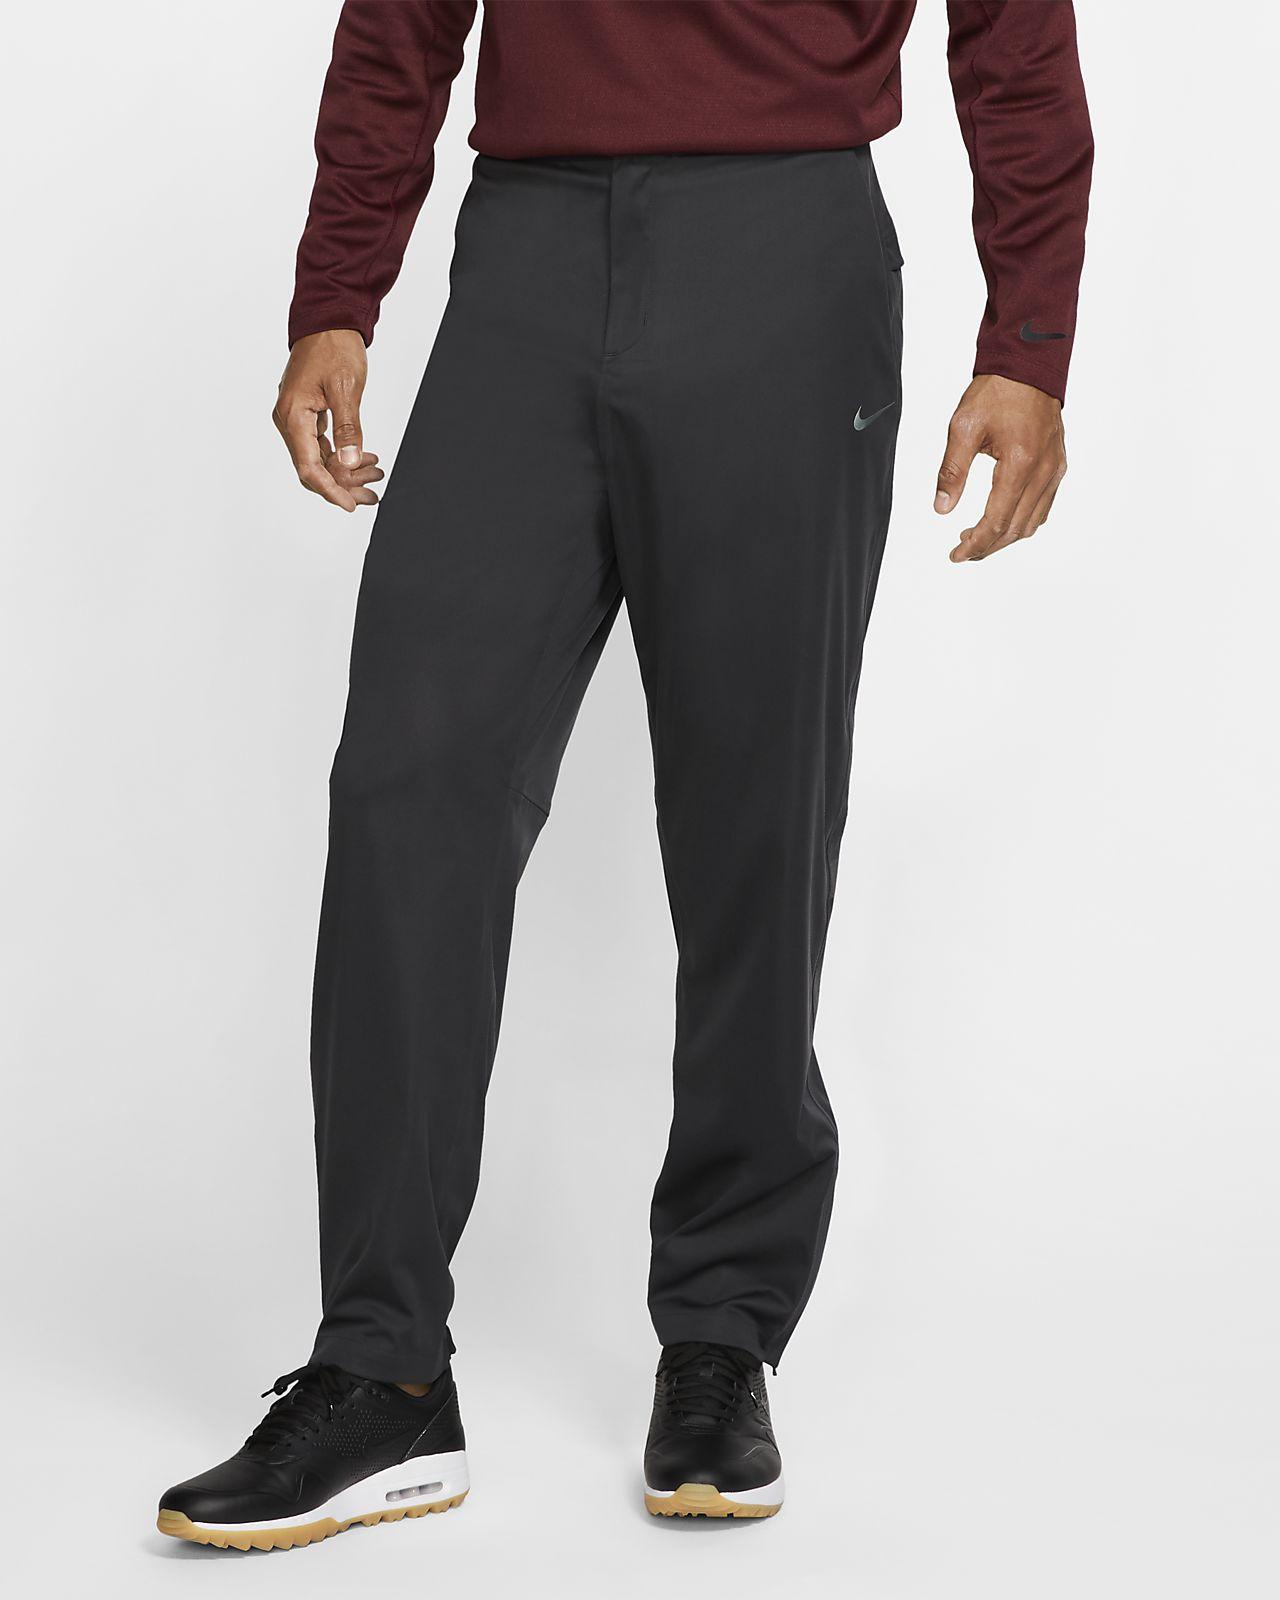 Nike AeroShield Men's Golf Trousers